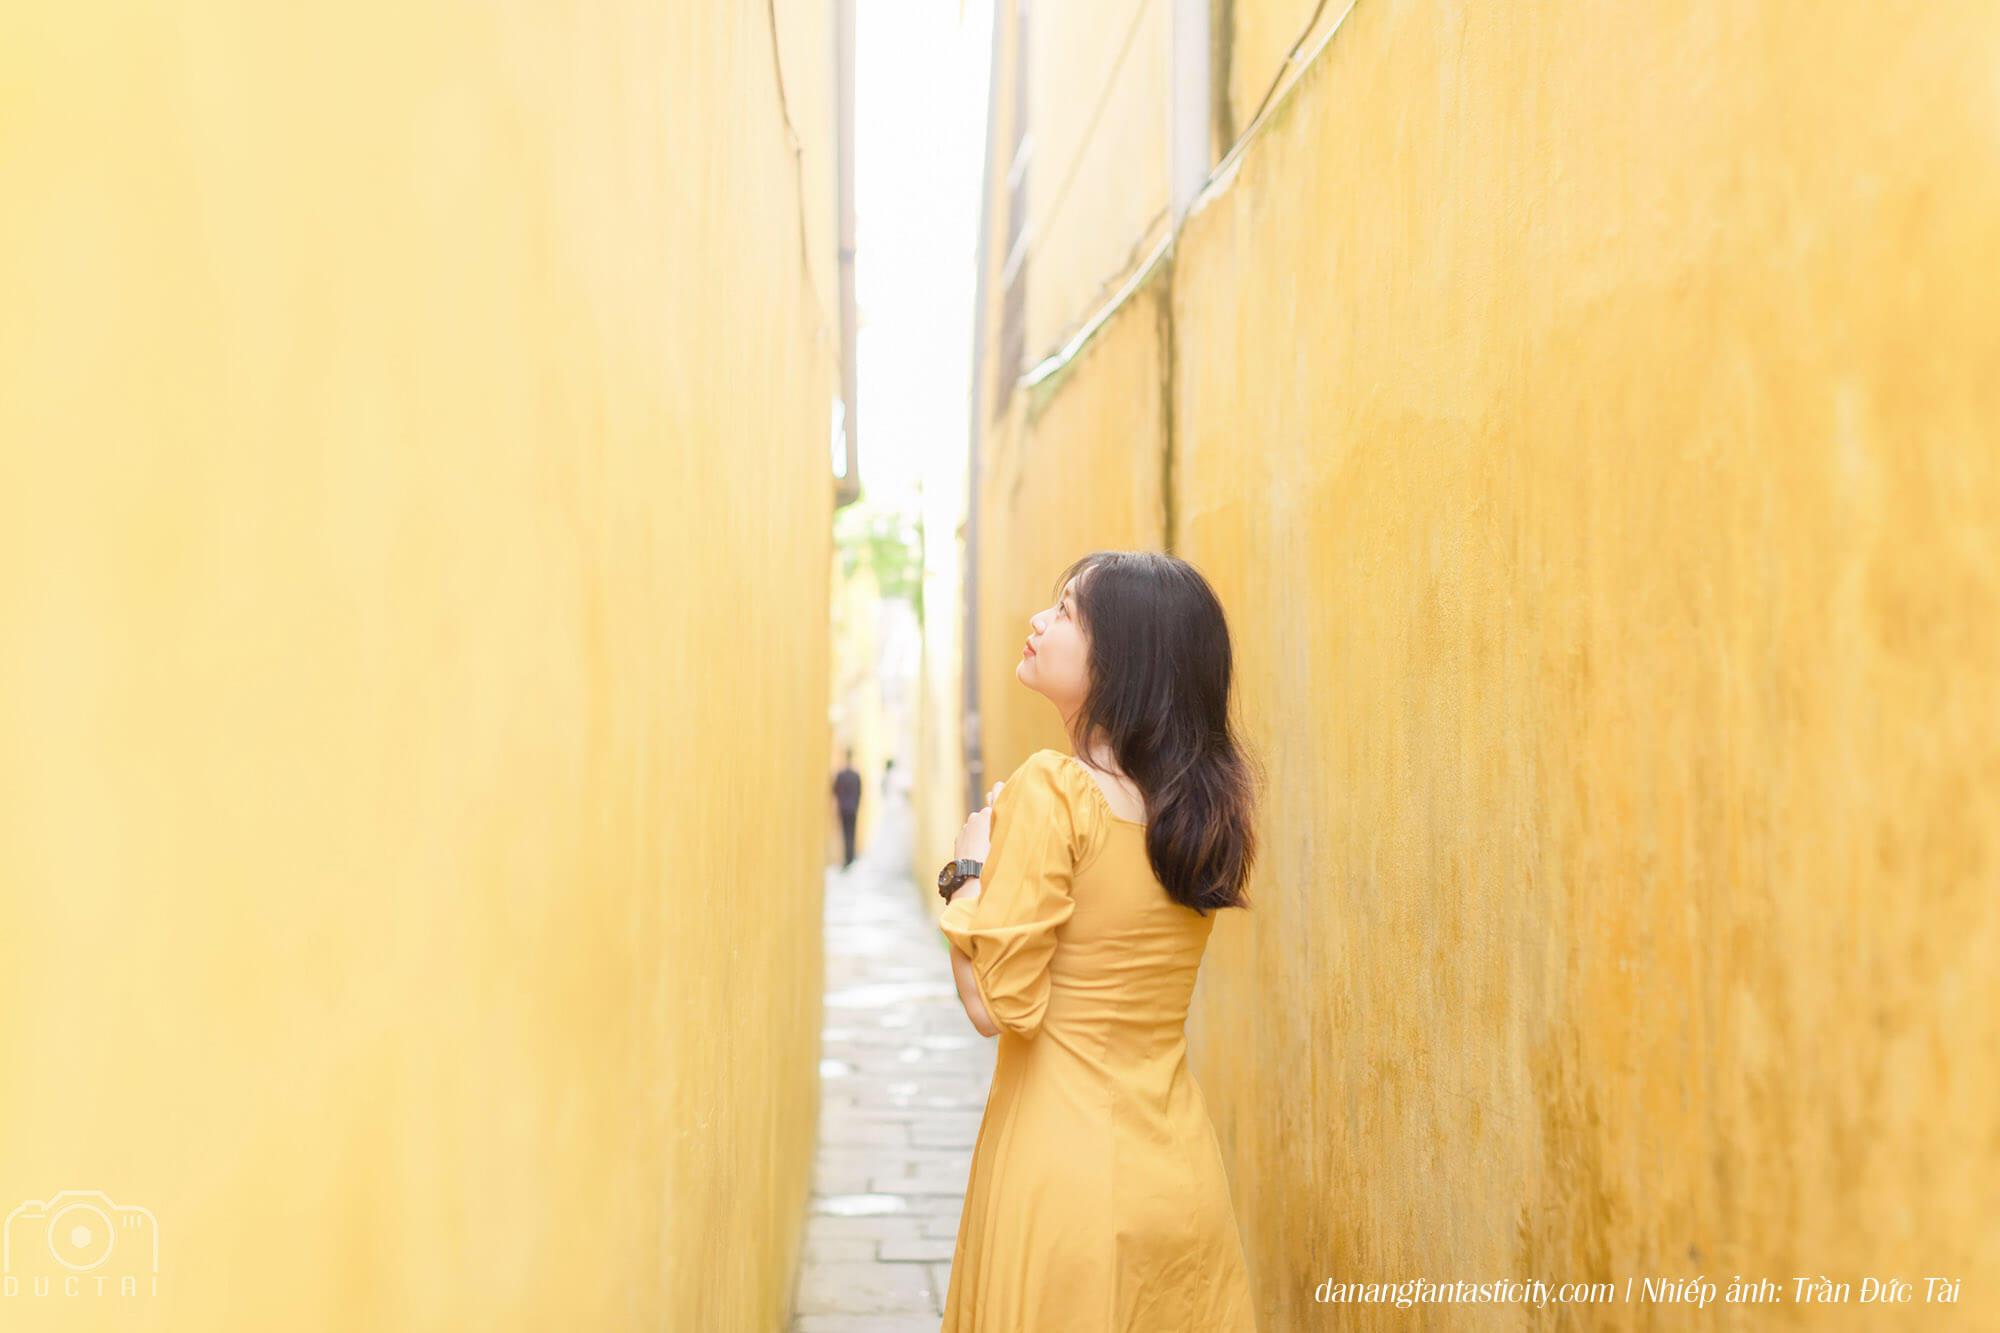 Pho Coi Hoi An Den Danang Hoi An Quang Nam Dung Quen Check In 03 Dia Diem Sieu Dep Nay 05